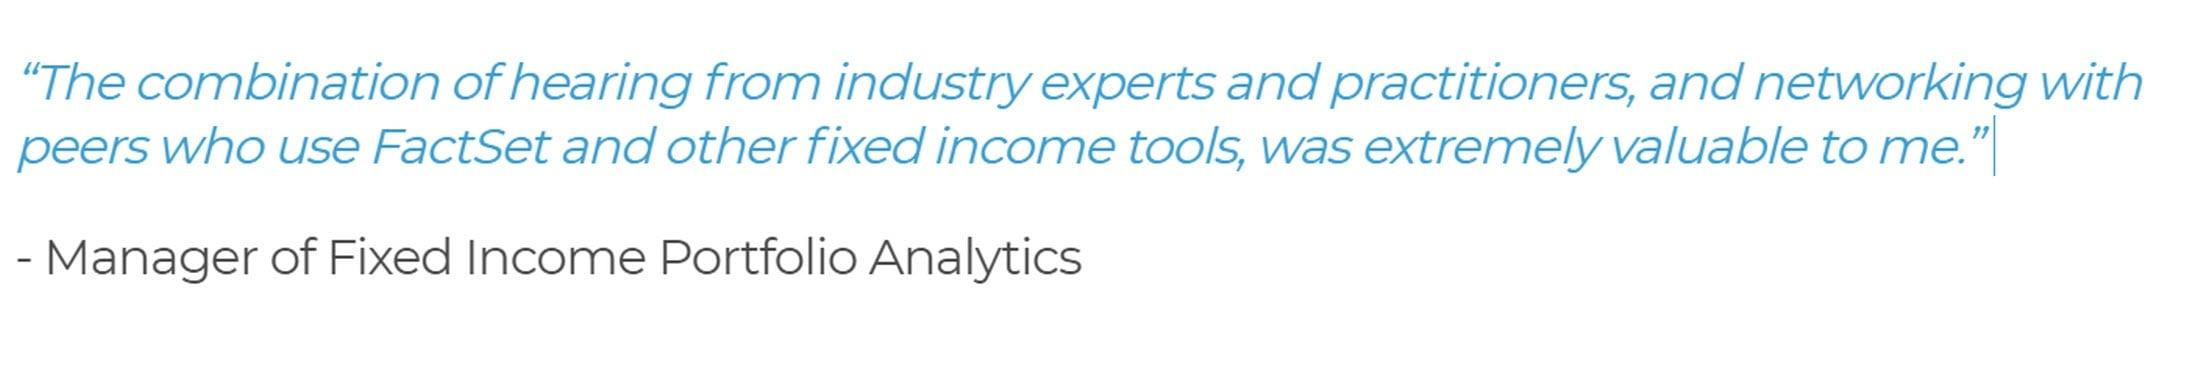 FI Portfolio Analytics Quote.jpg